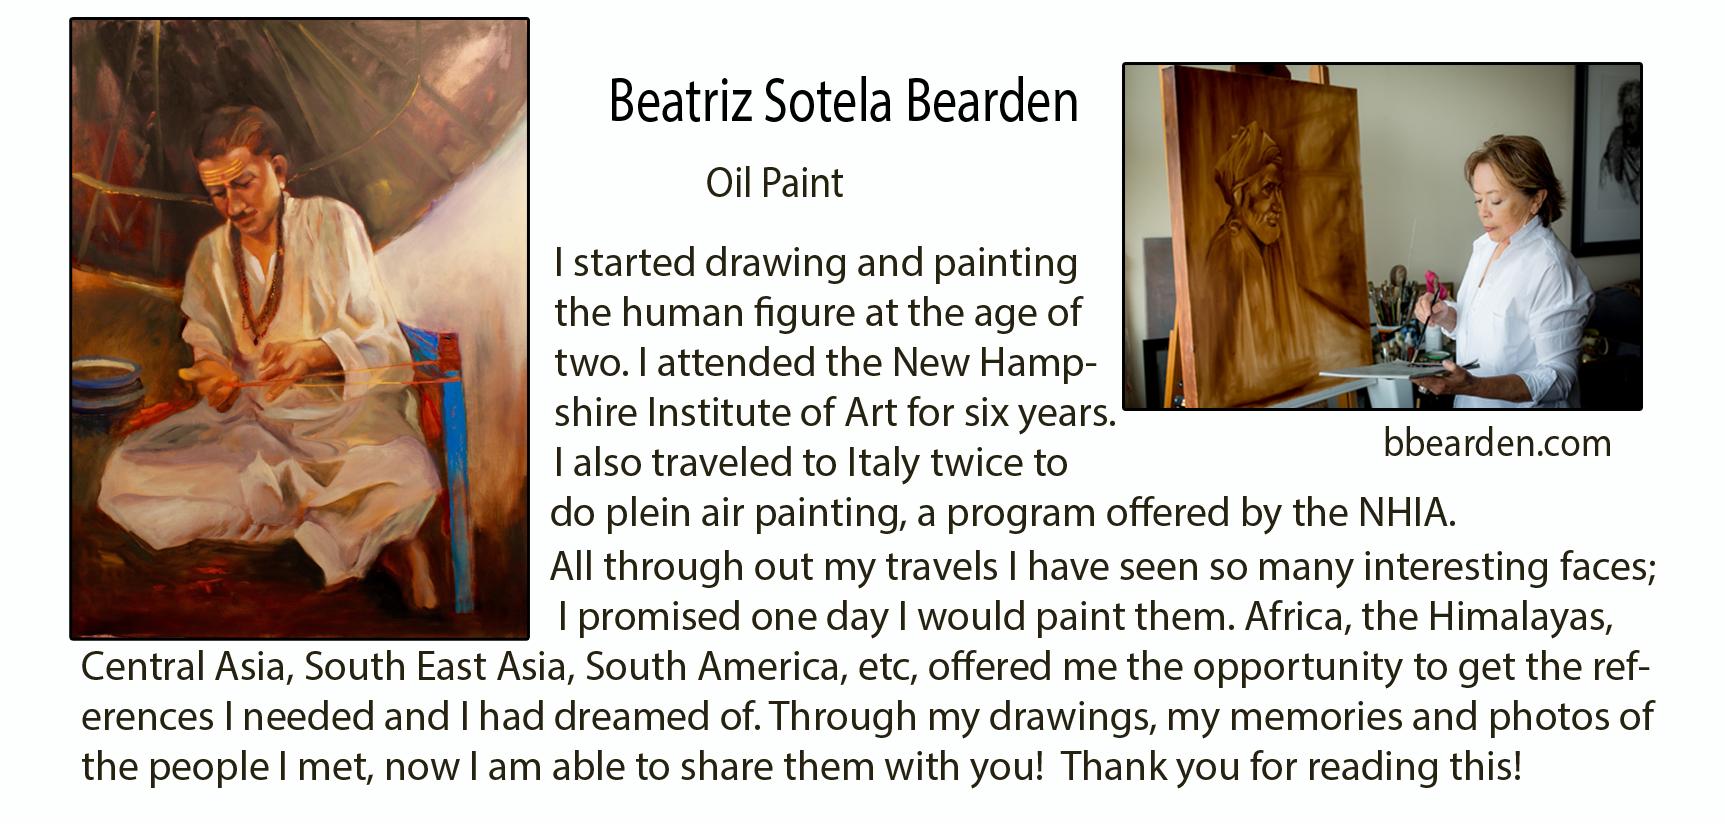 Bea profile for FB.jpg